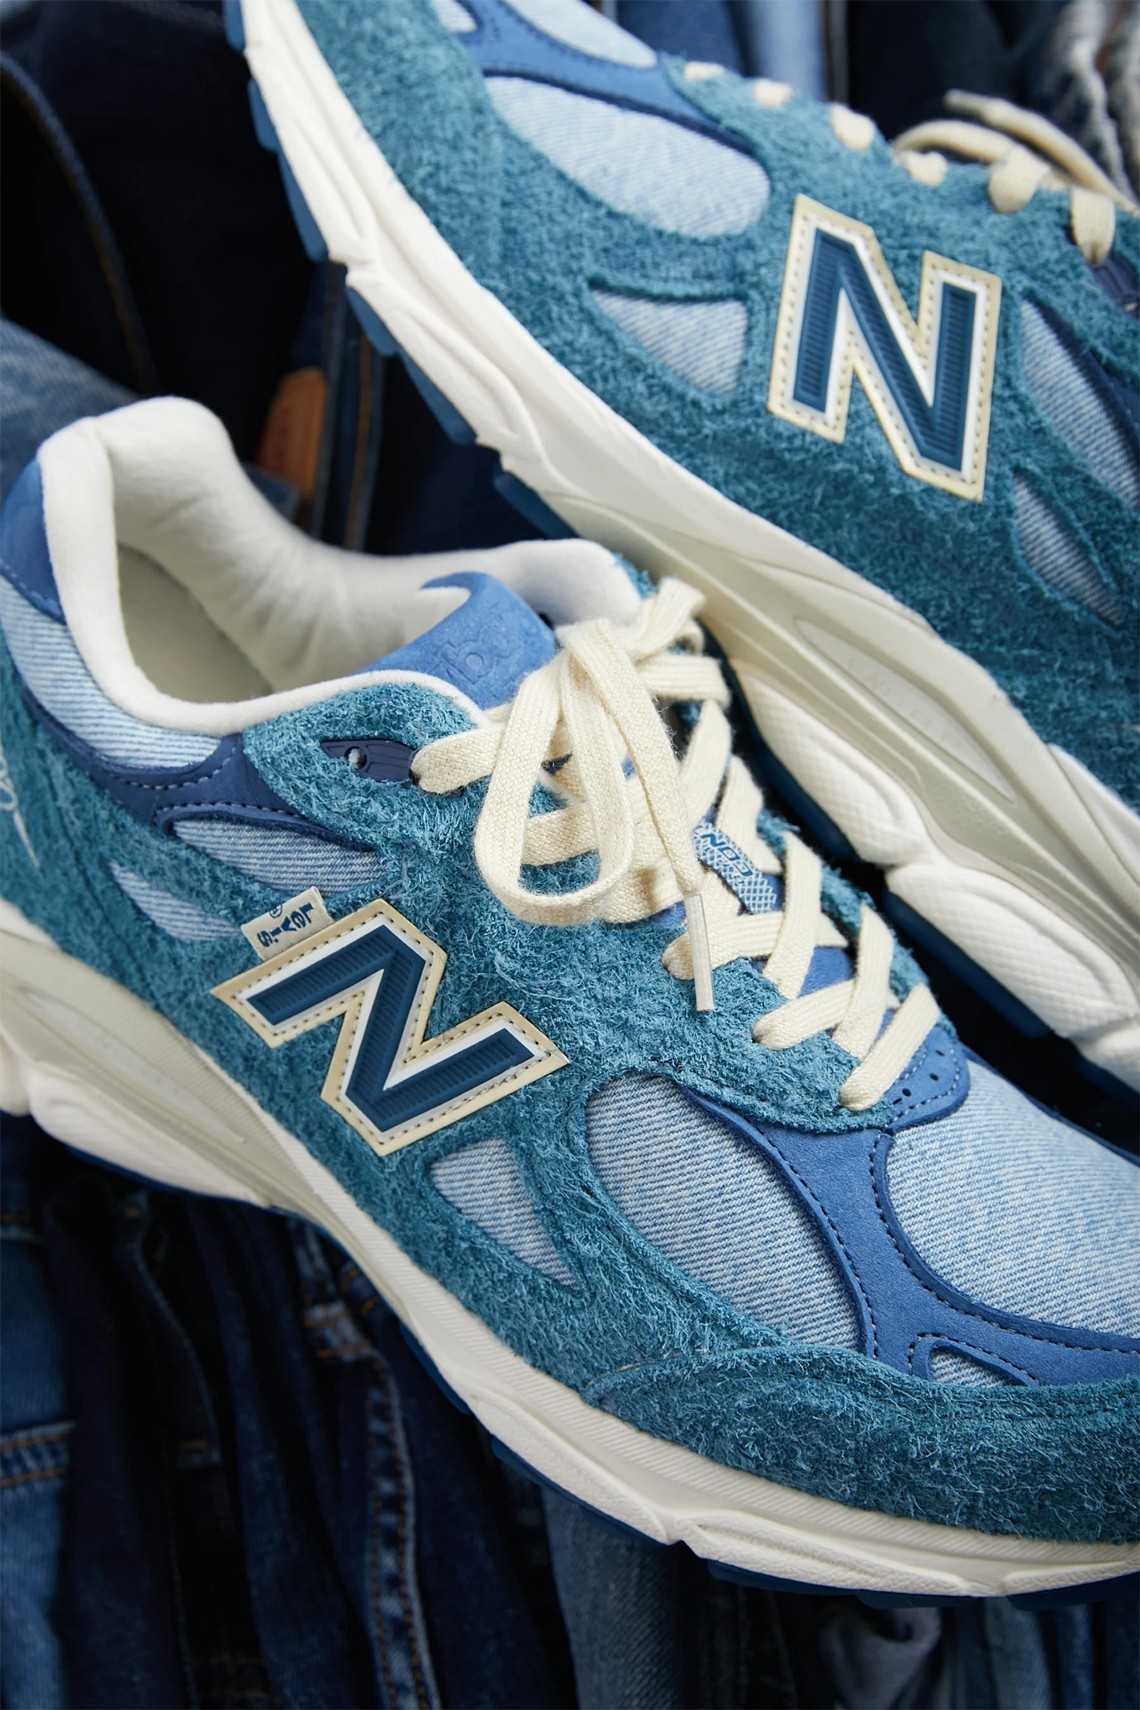 New Balance,NB,Levi's,AAPE,Joe  快上车!四款 New Balance 重磅联名开始抽签了!